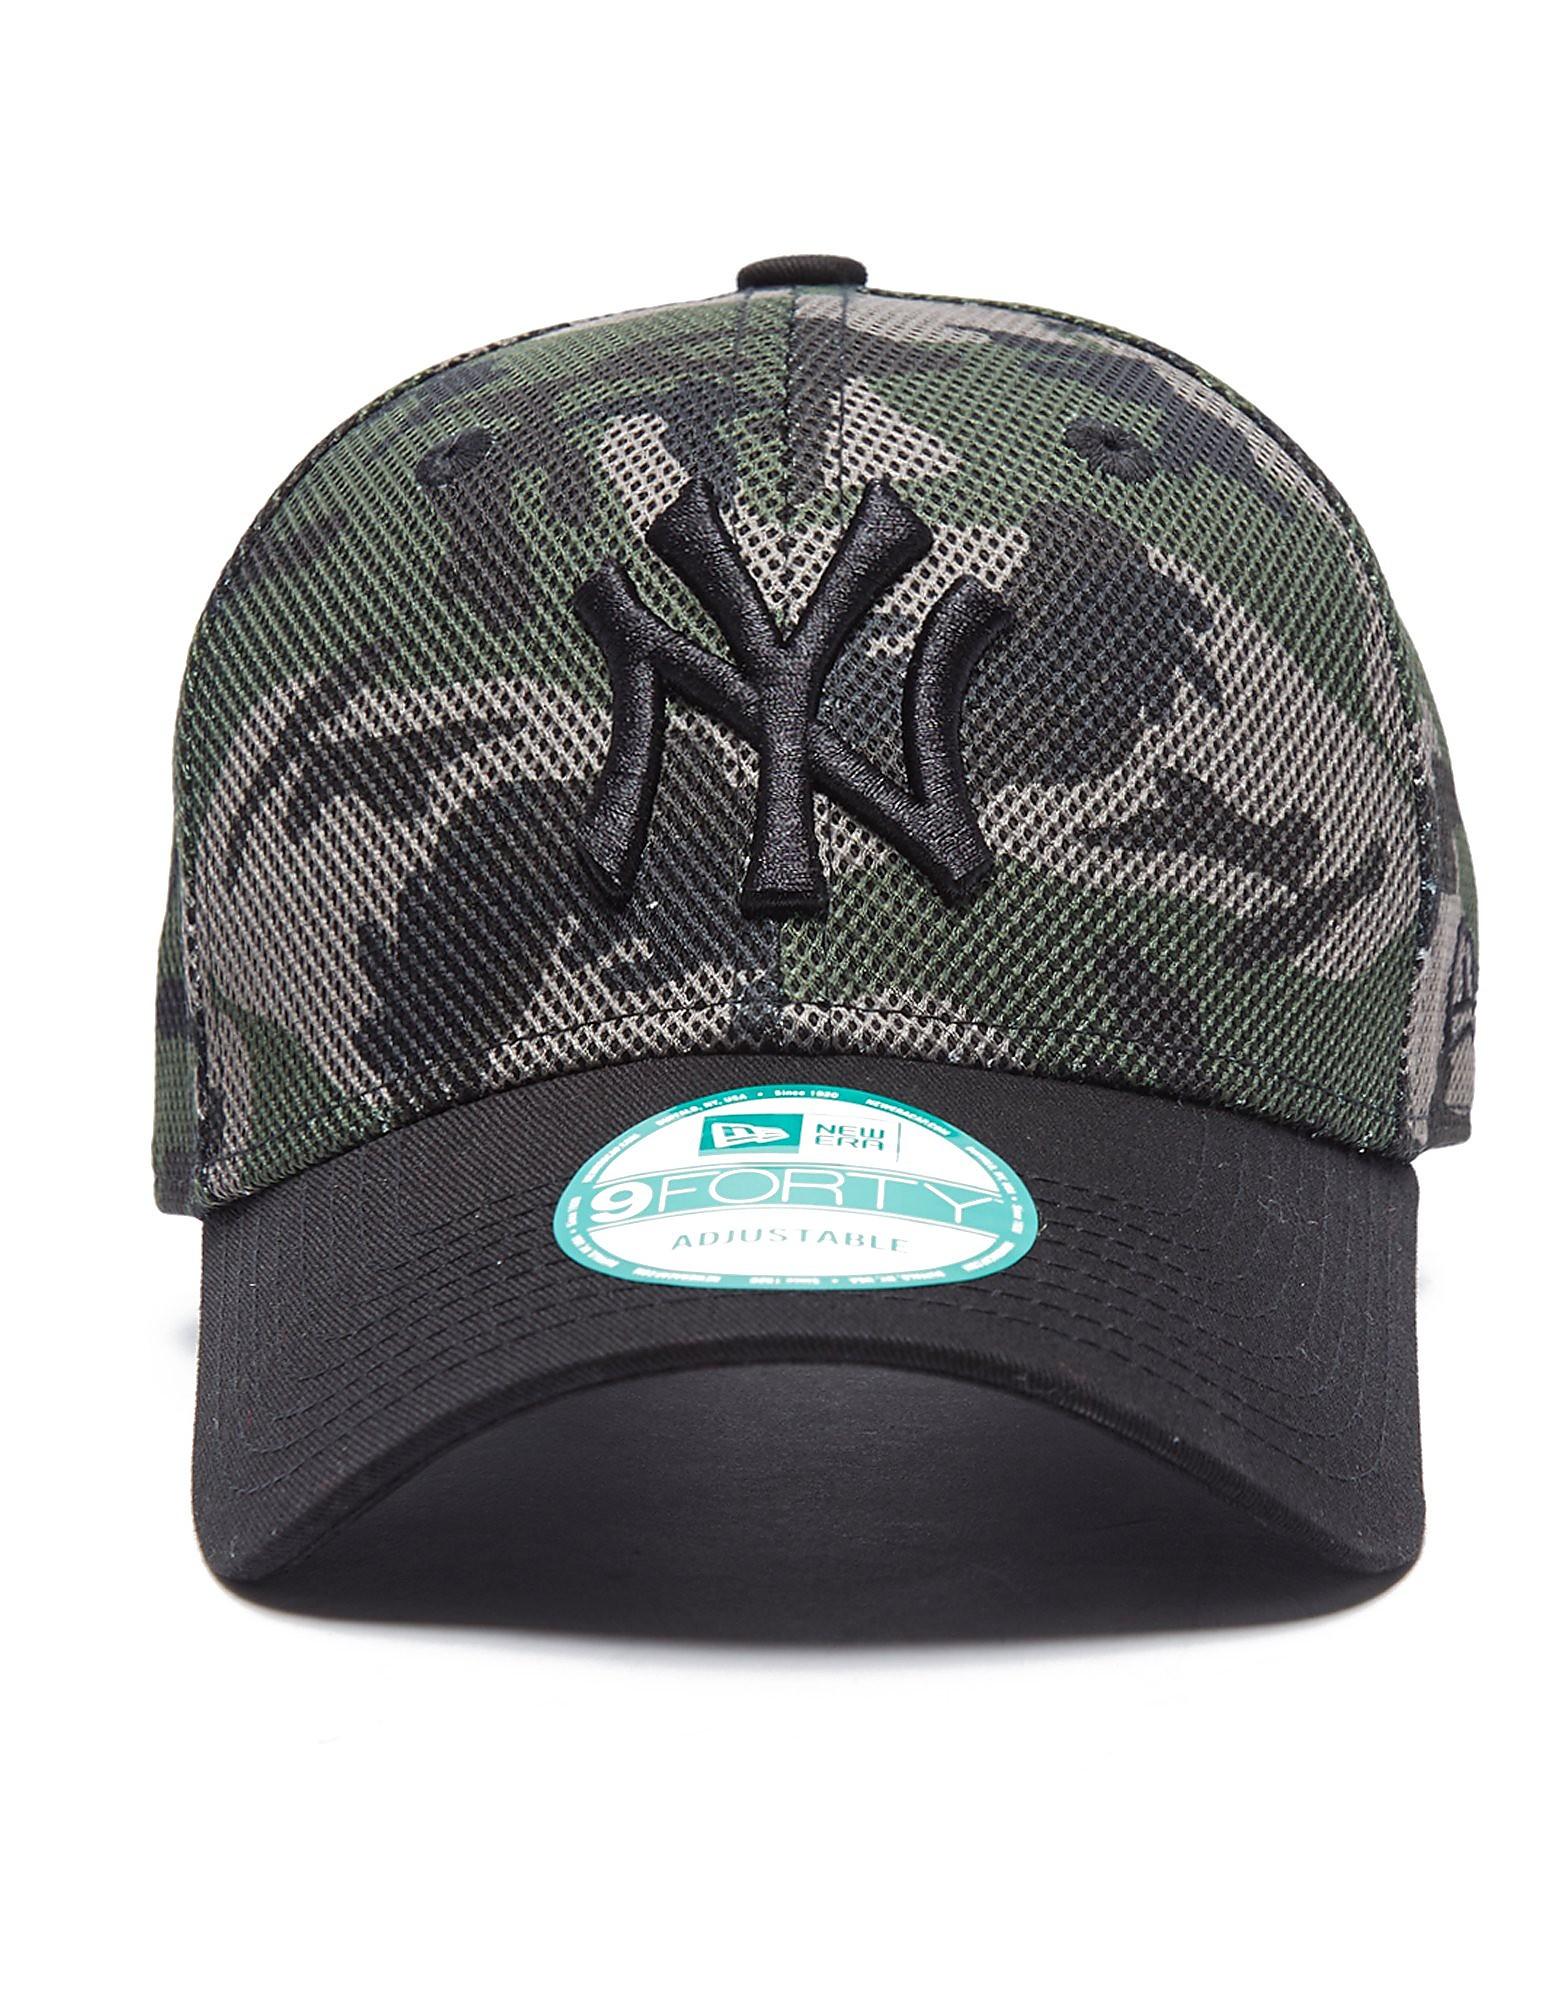 New Era 9FORTY MLB New York Yankees Mesh Cap